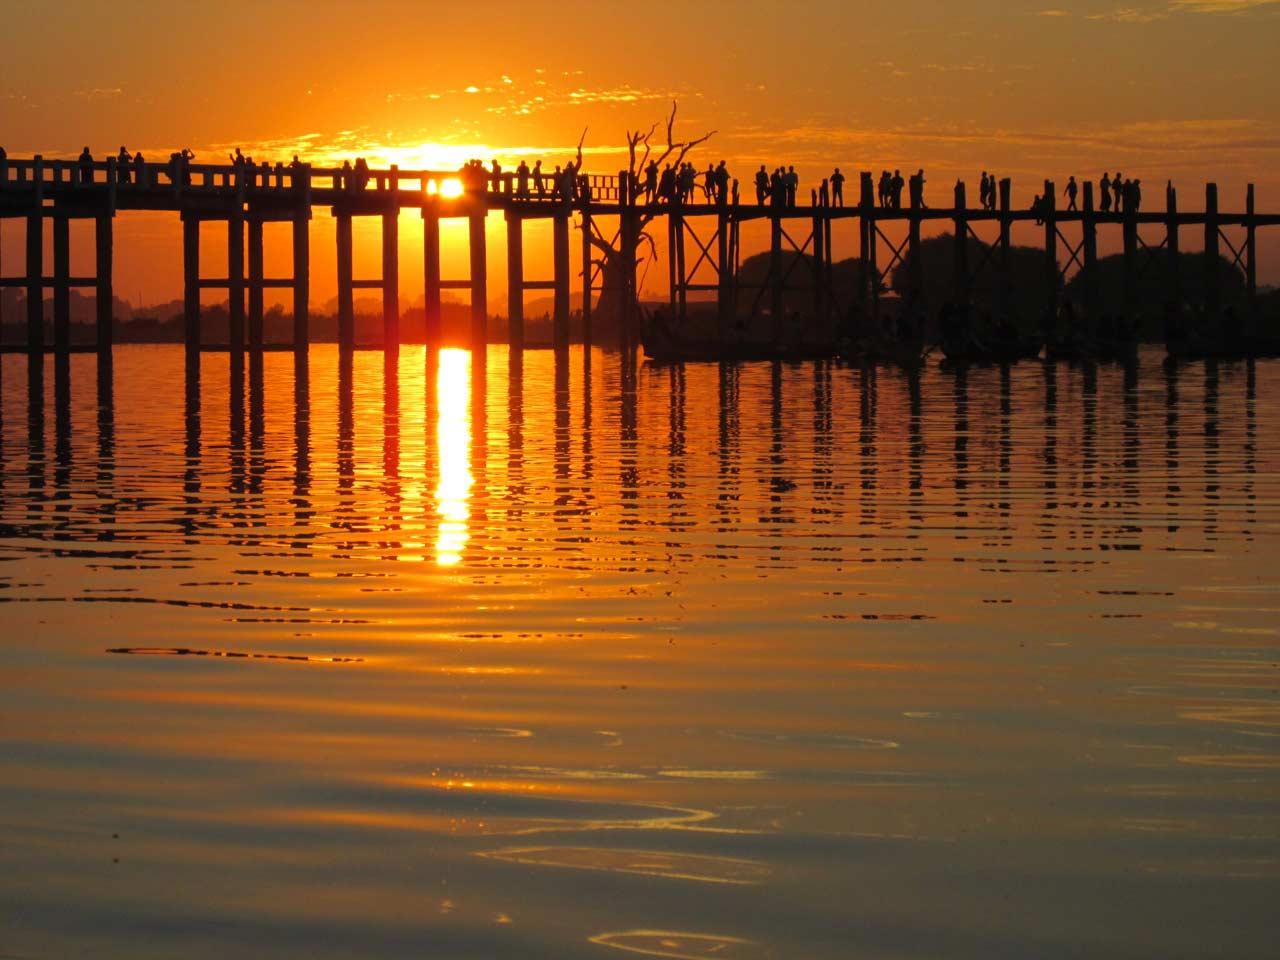 amarapura-tramonto-birmania